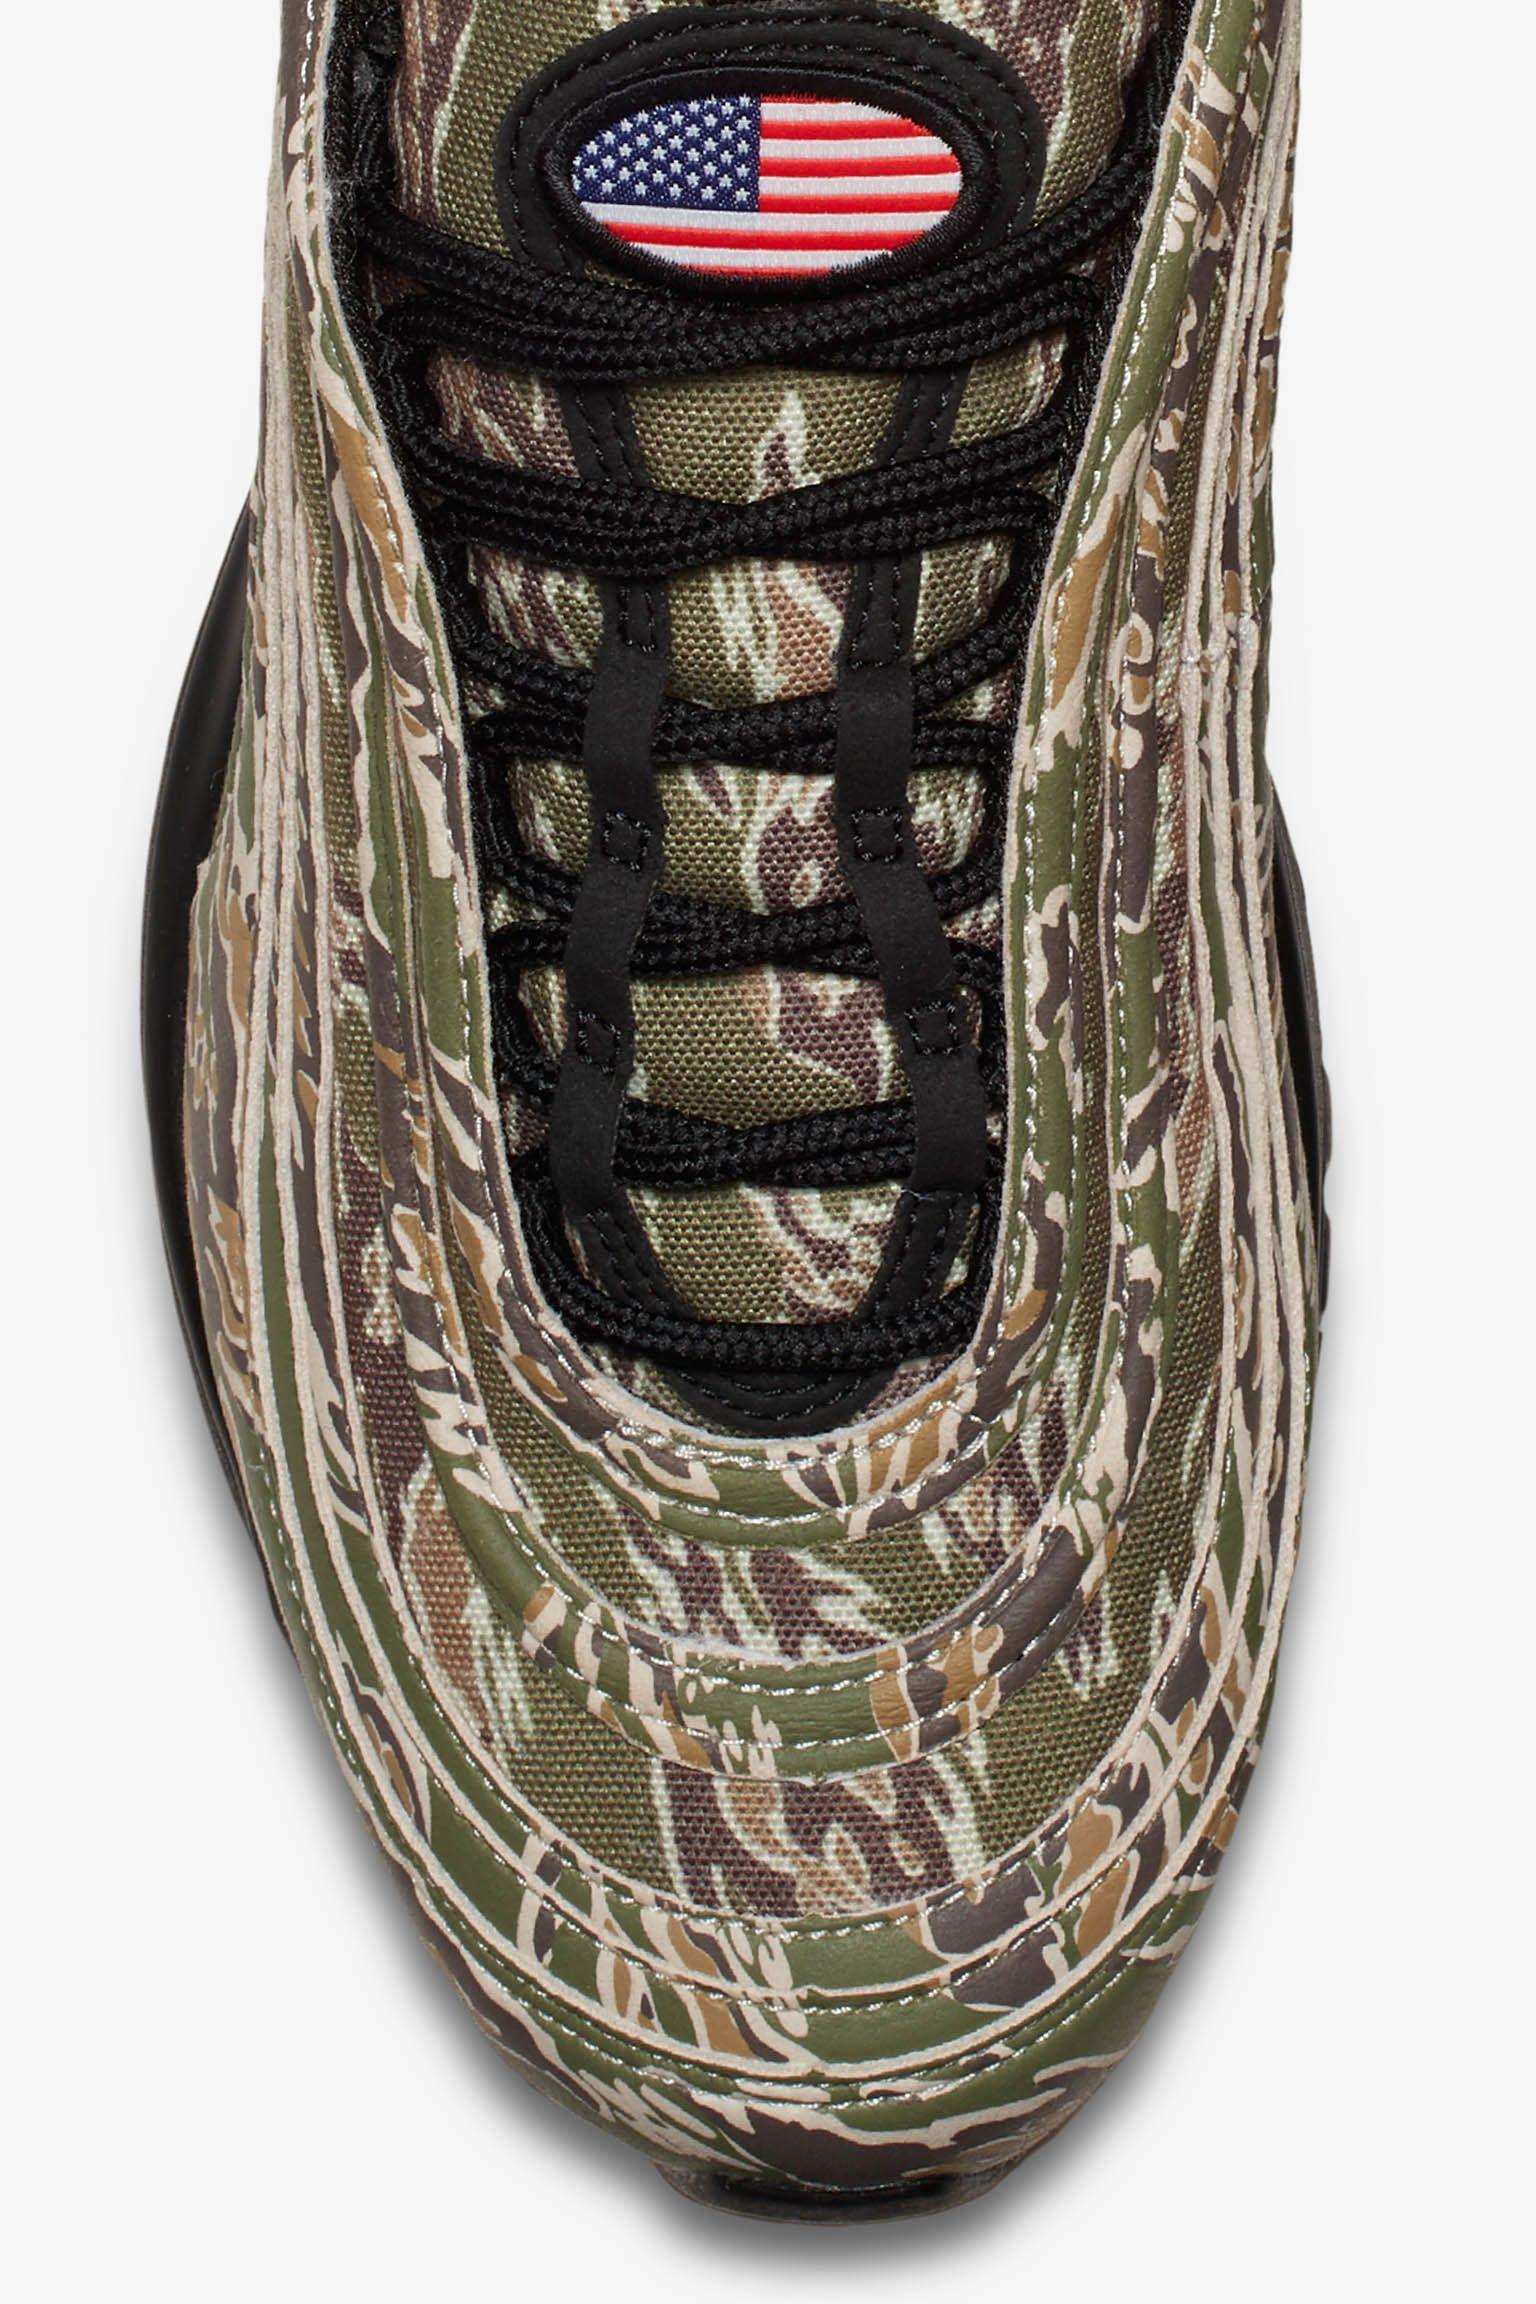 Nike Air Max 97 Premium Camo 'USA' Release Date